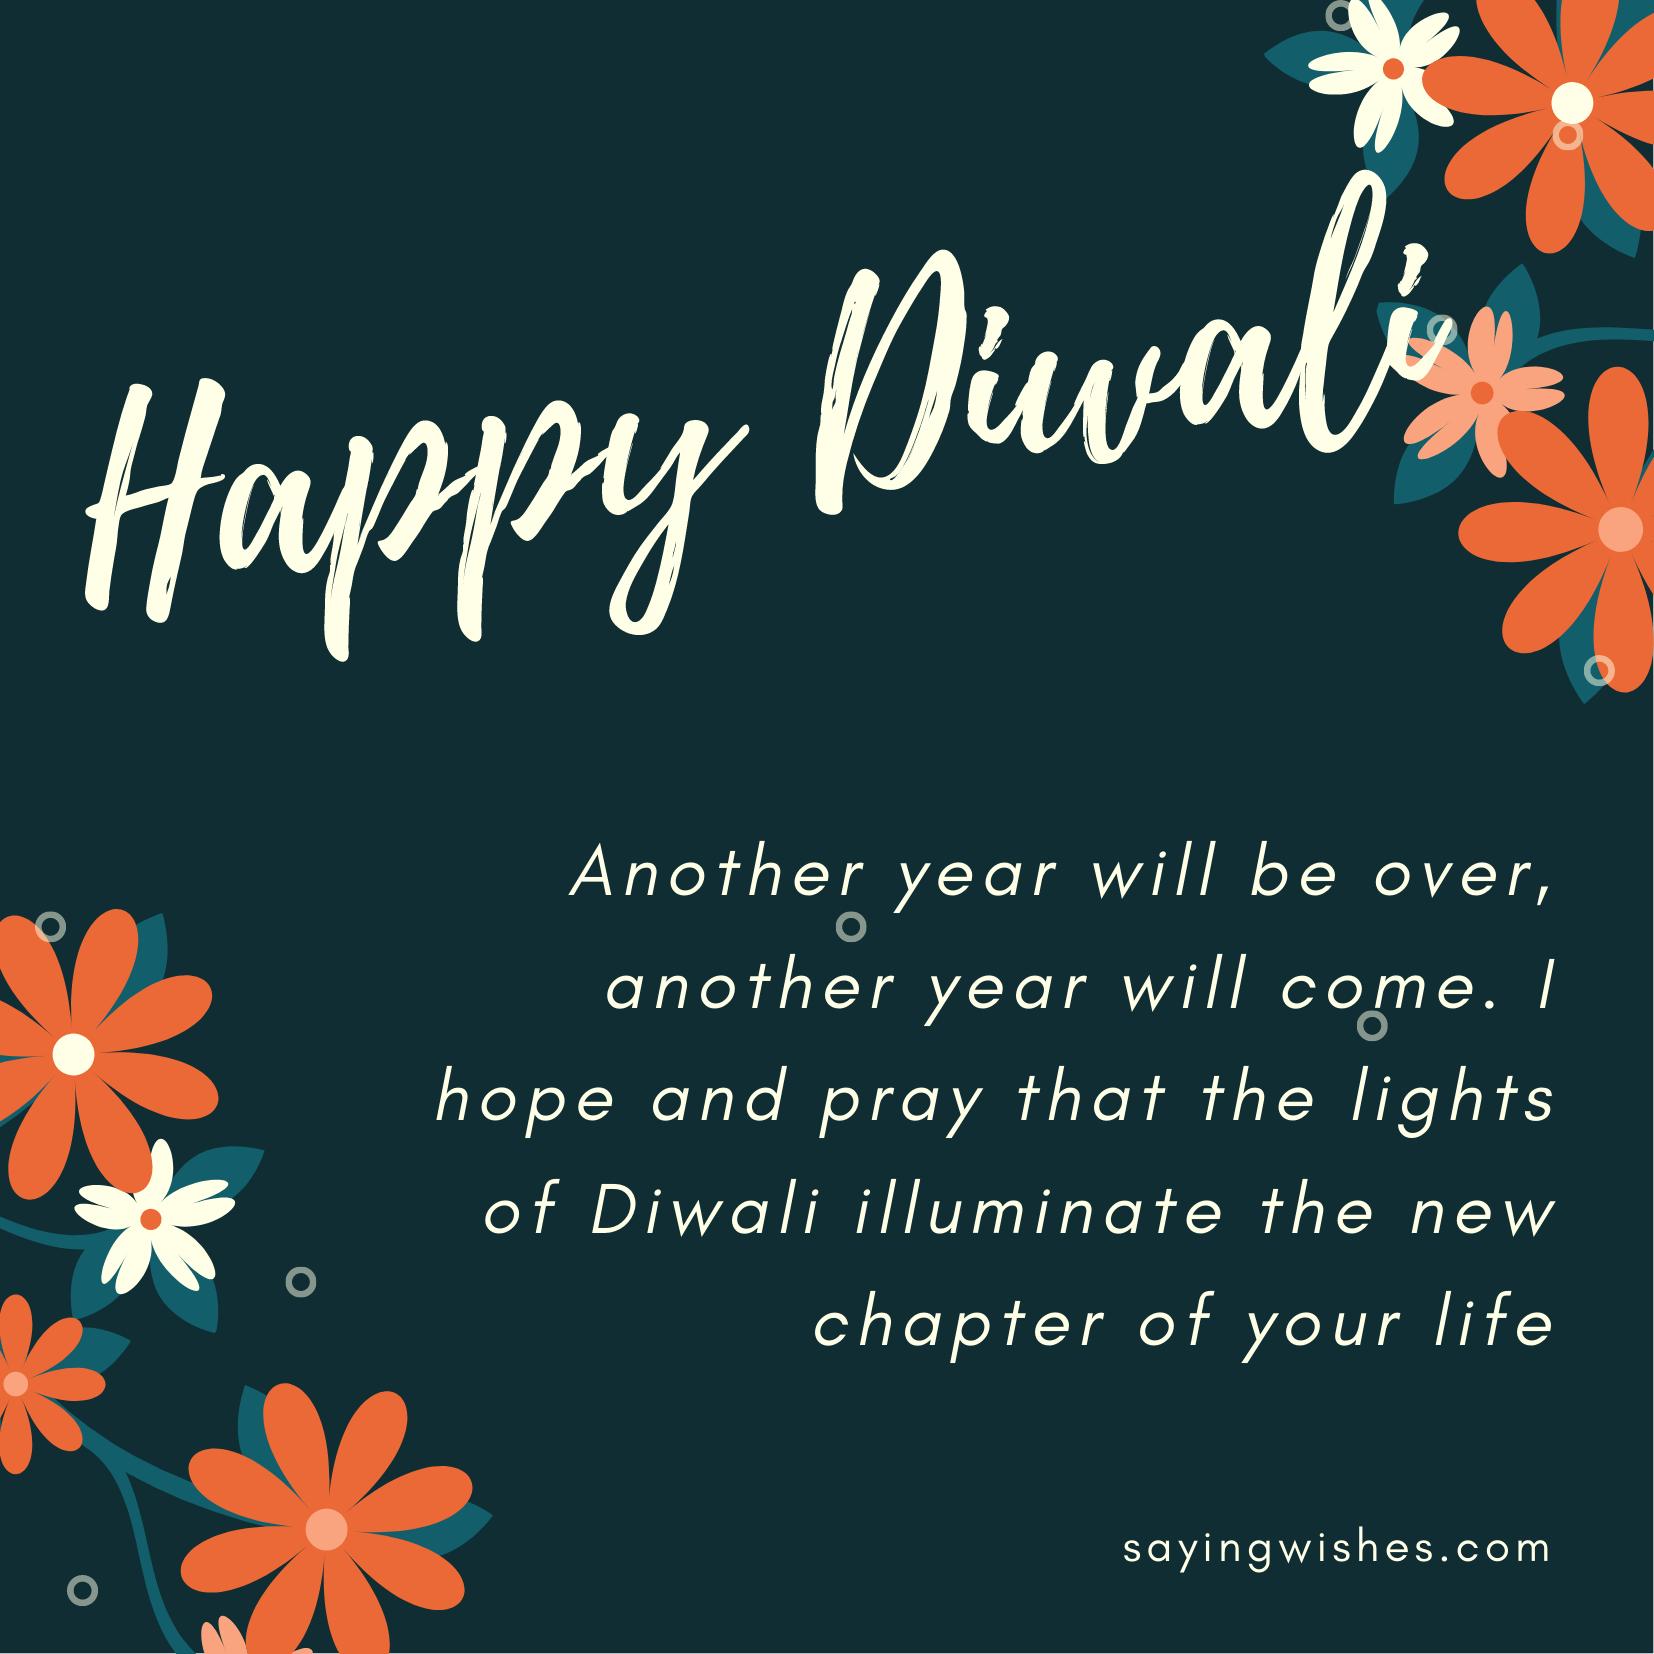 happy diwali 2021 messages